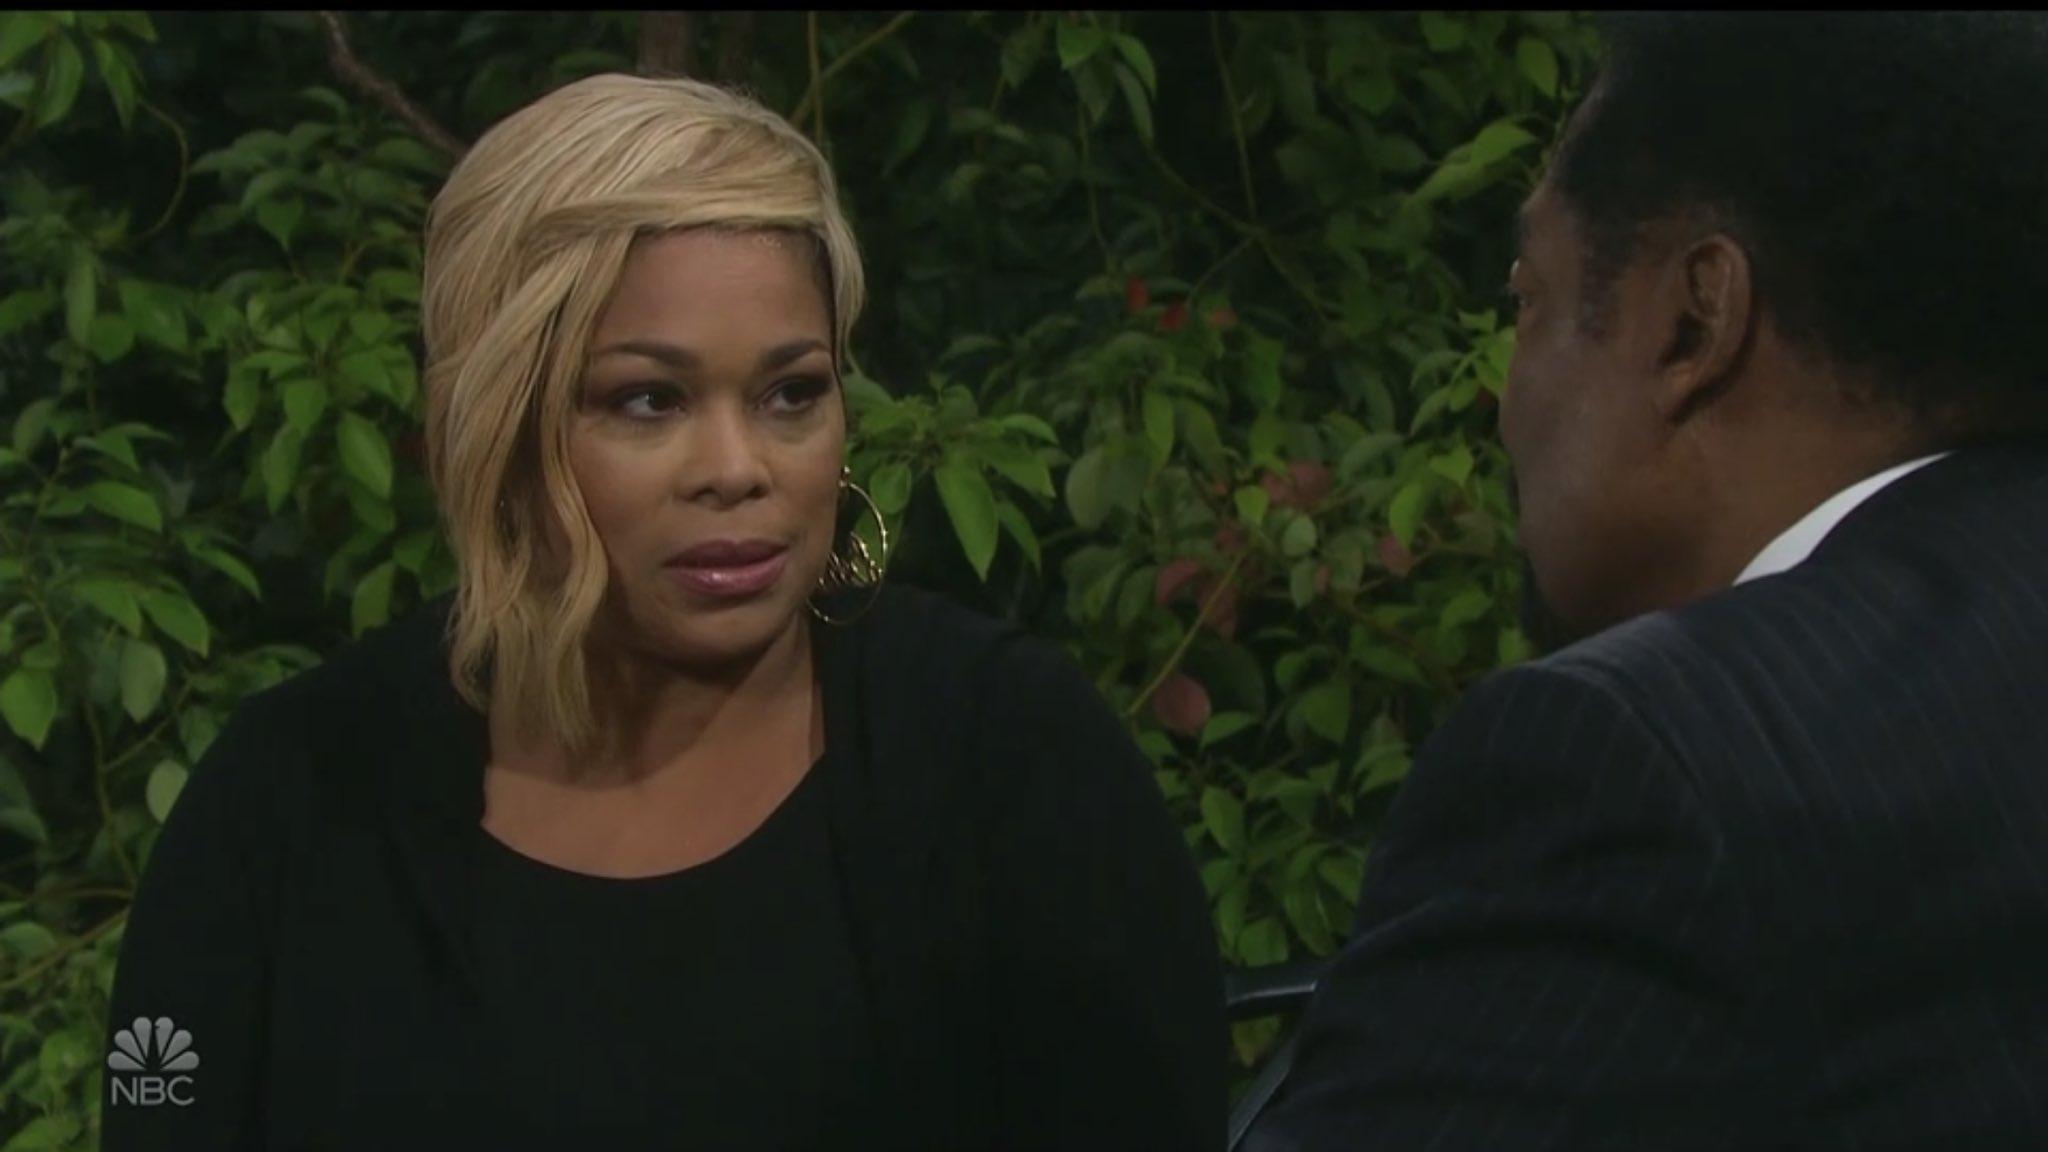 T-Boz as Sheila Watkins Quits Job After Kissing Mayor Carver